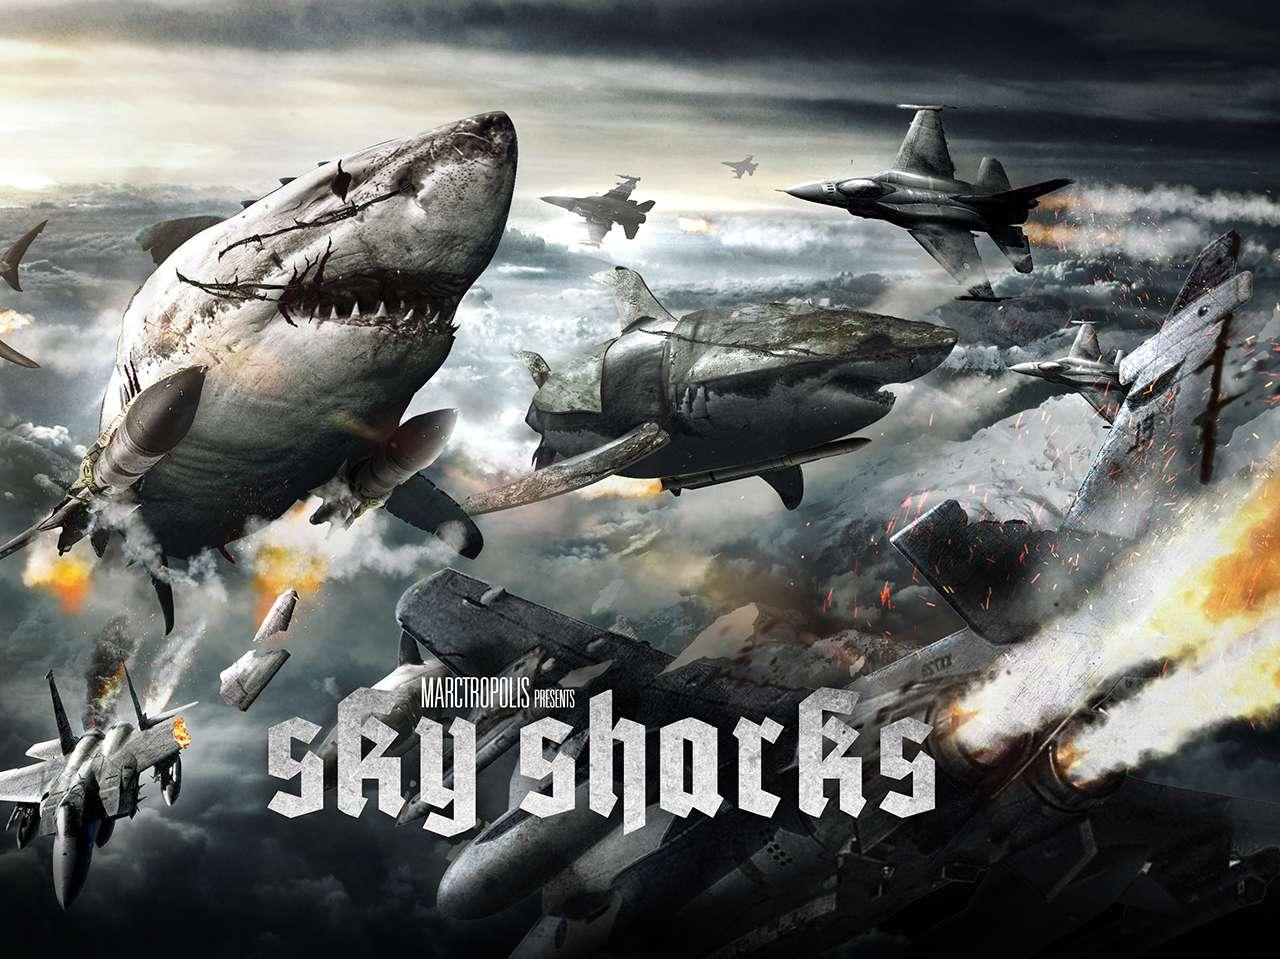 'Sky Sharks' tendrá como protagonistas a Cary-Hiroyuki Tagawa, Robert LaSardo, Nick Principe, Lar Park-Lincoln y Lynn Lowry. Foto: Marctropolis-Film